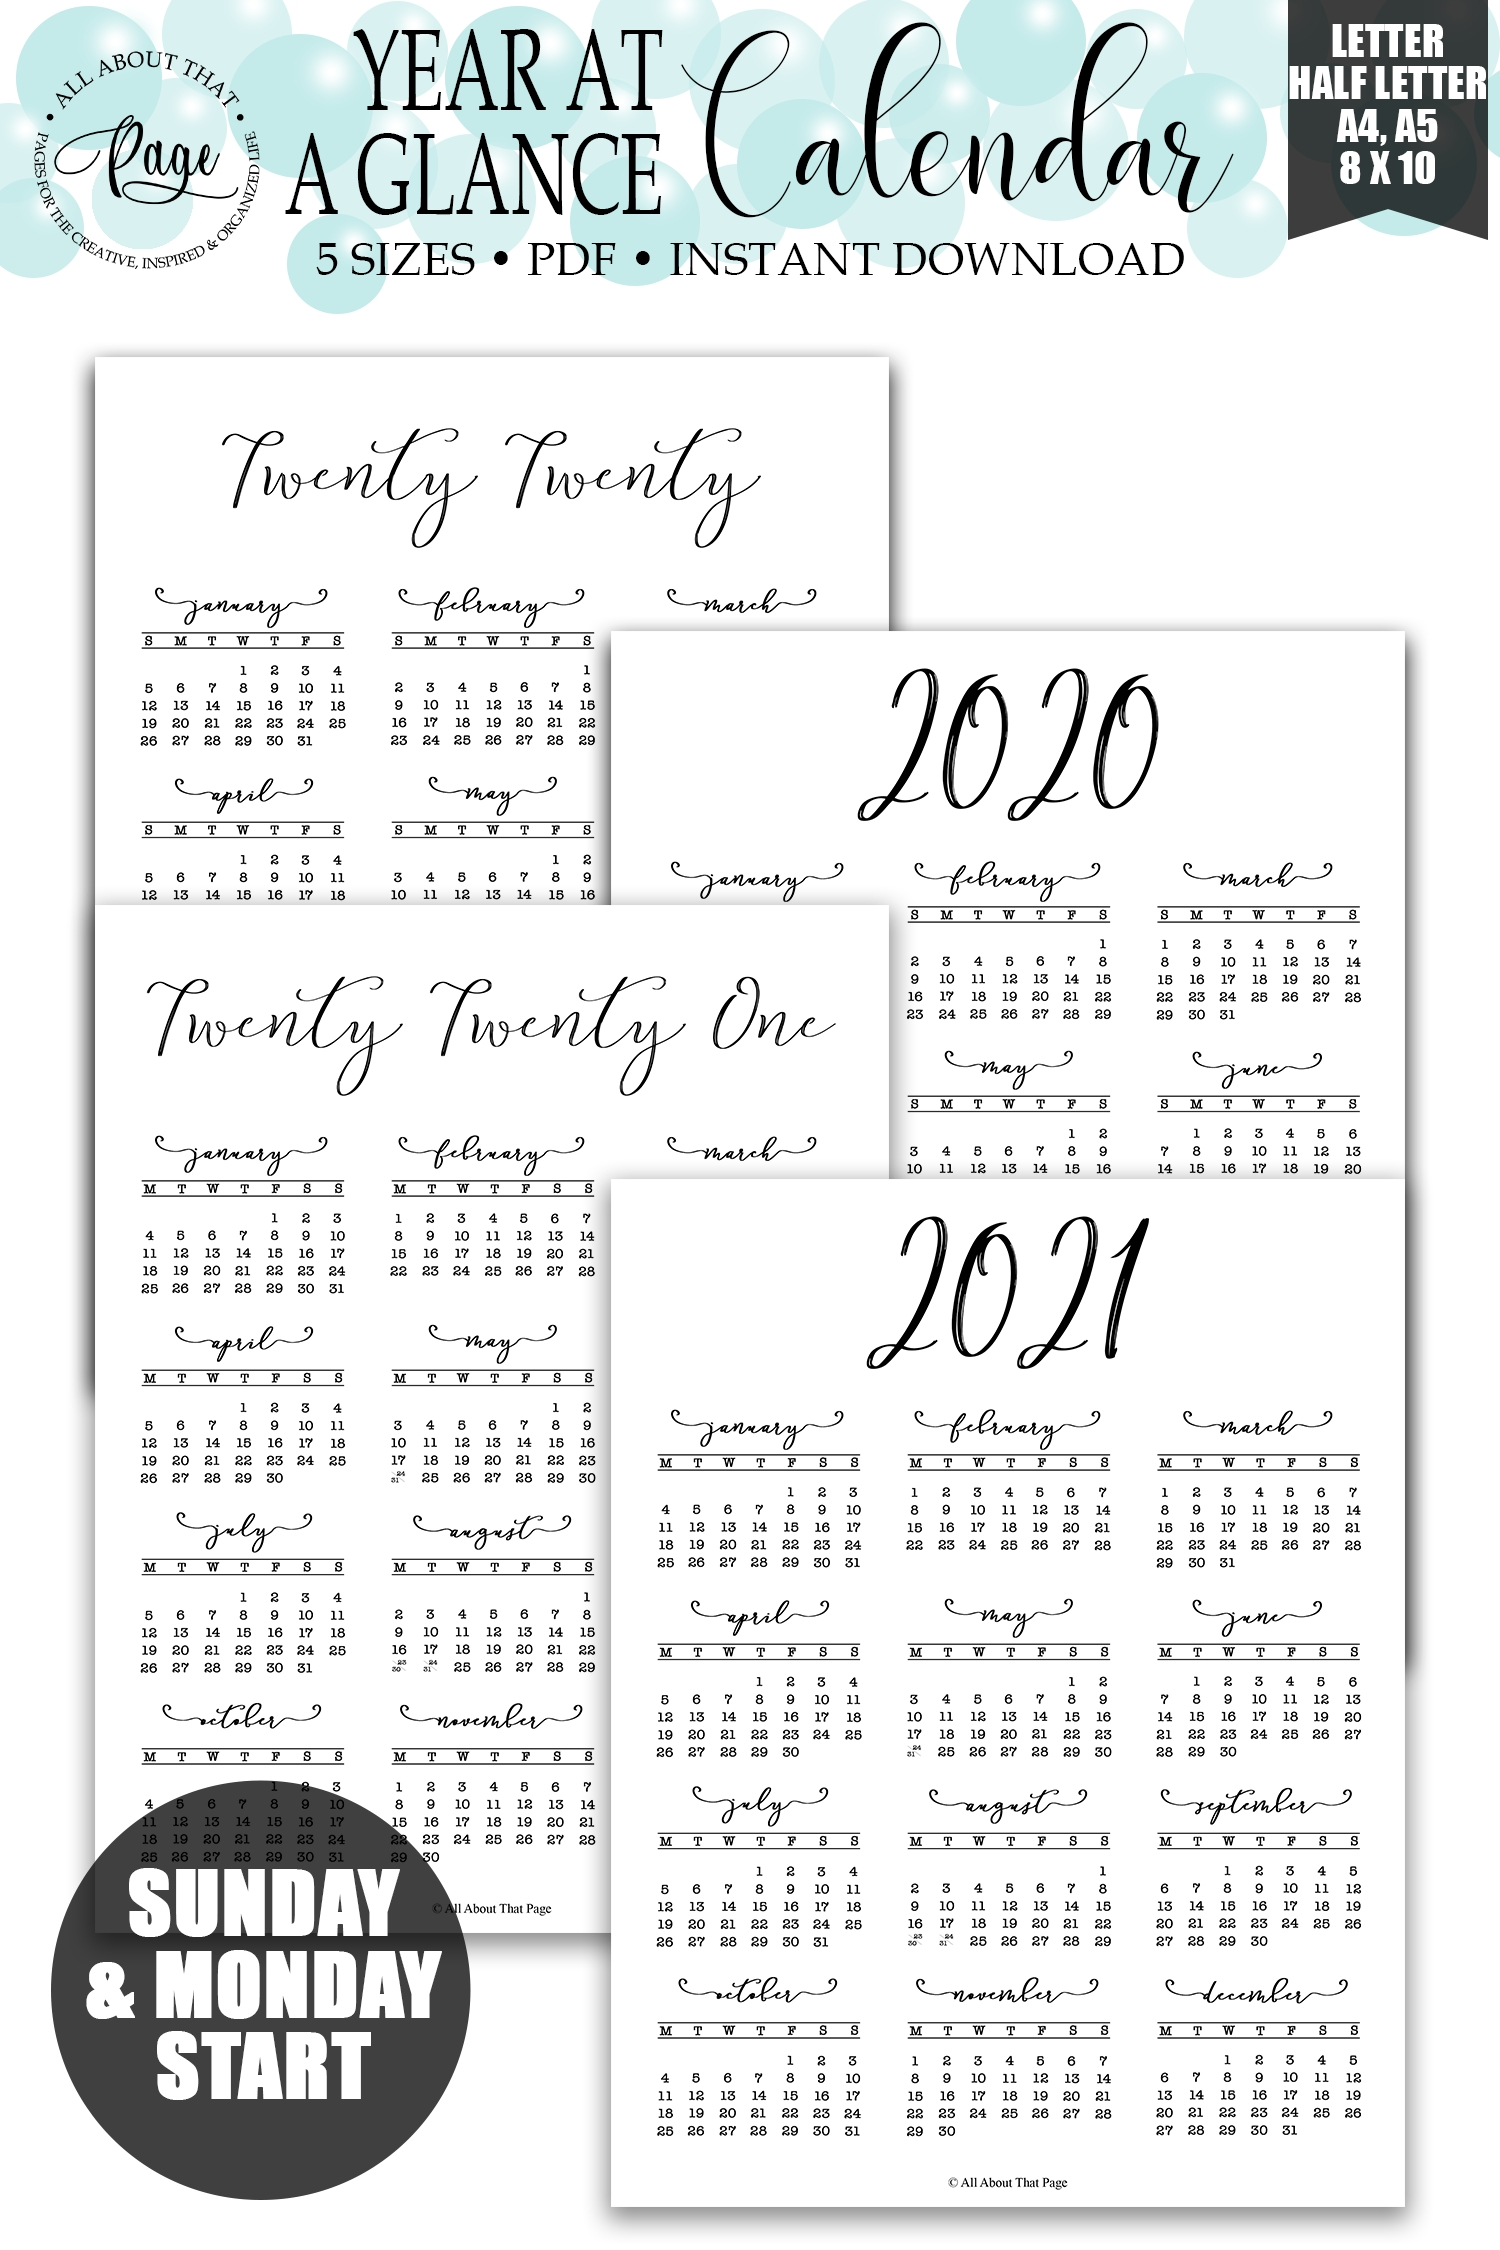 2020 2021 Year At A Glance Calendar Printable, Simple